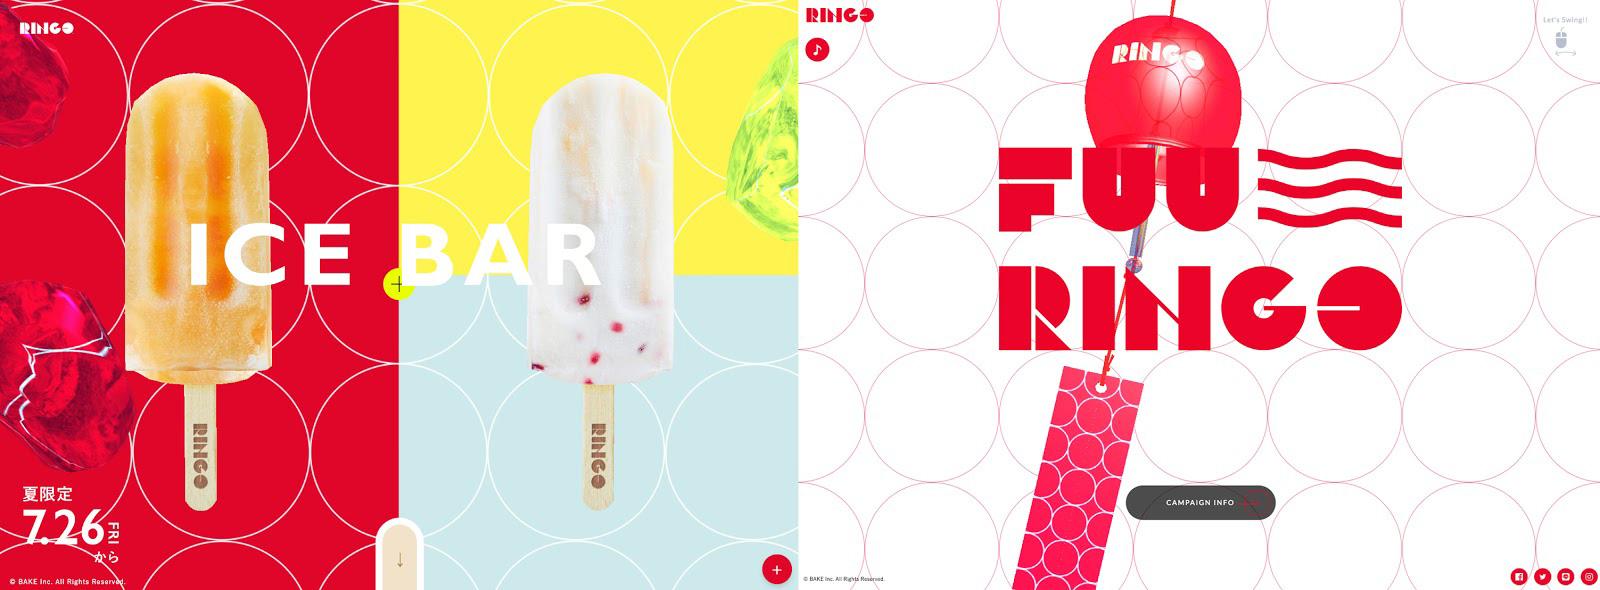 「RINGO」のLPサイト(画像提供:BAKE)